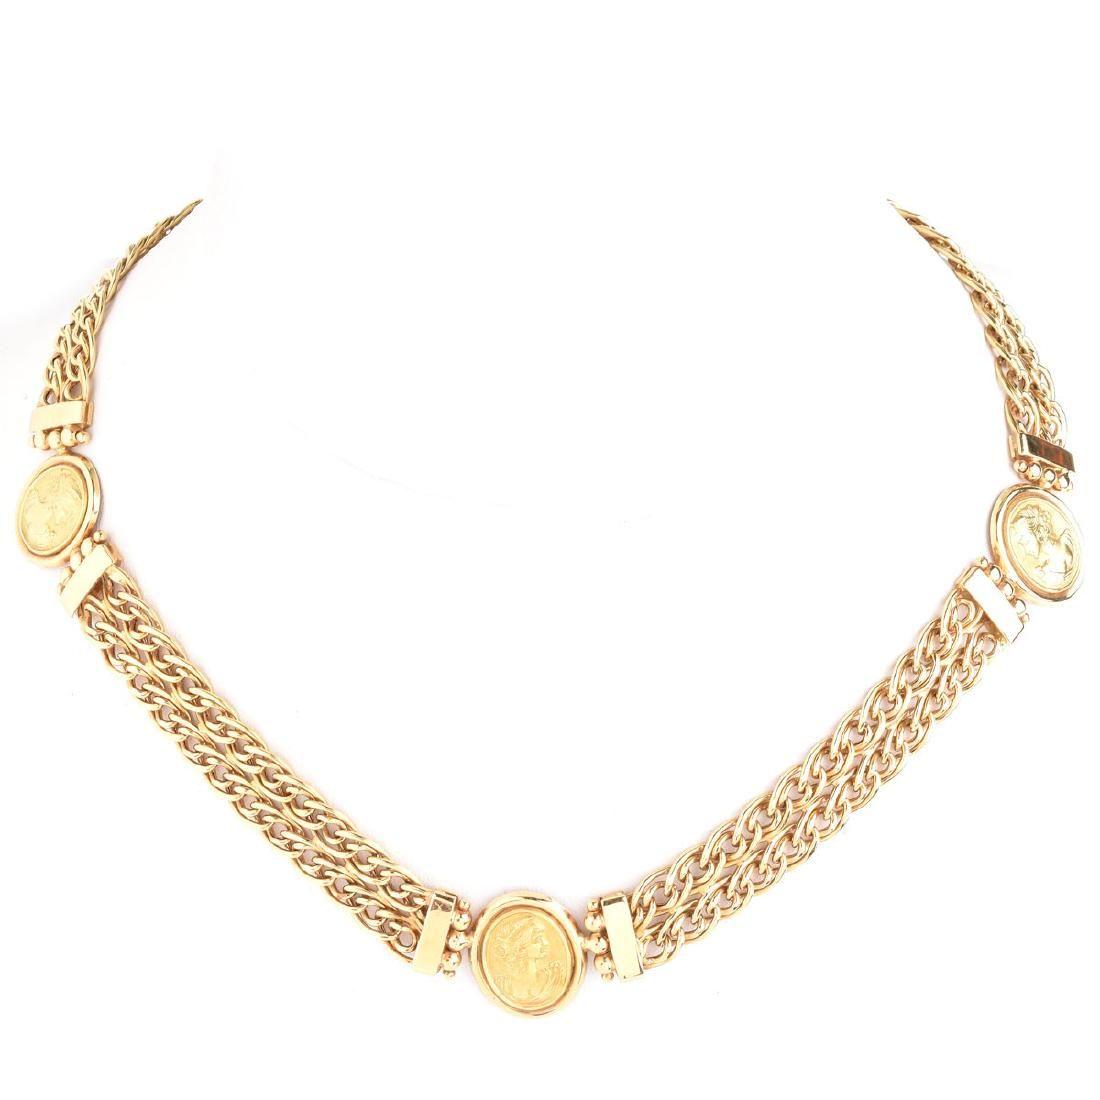 Vintage Italian 18K Gold Necklace